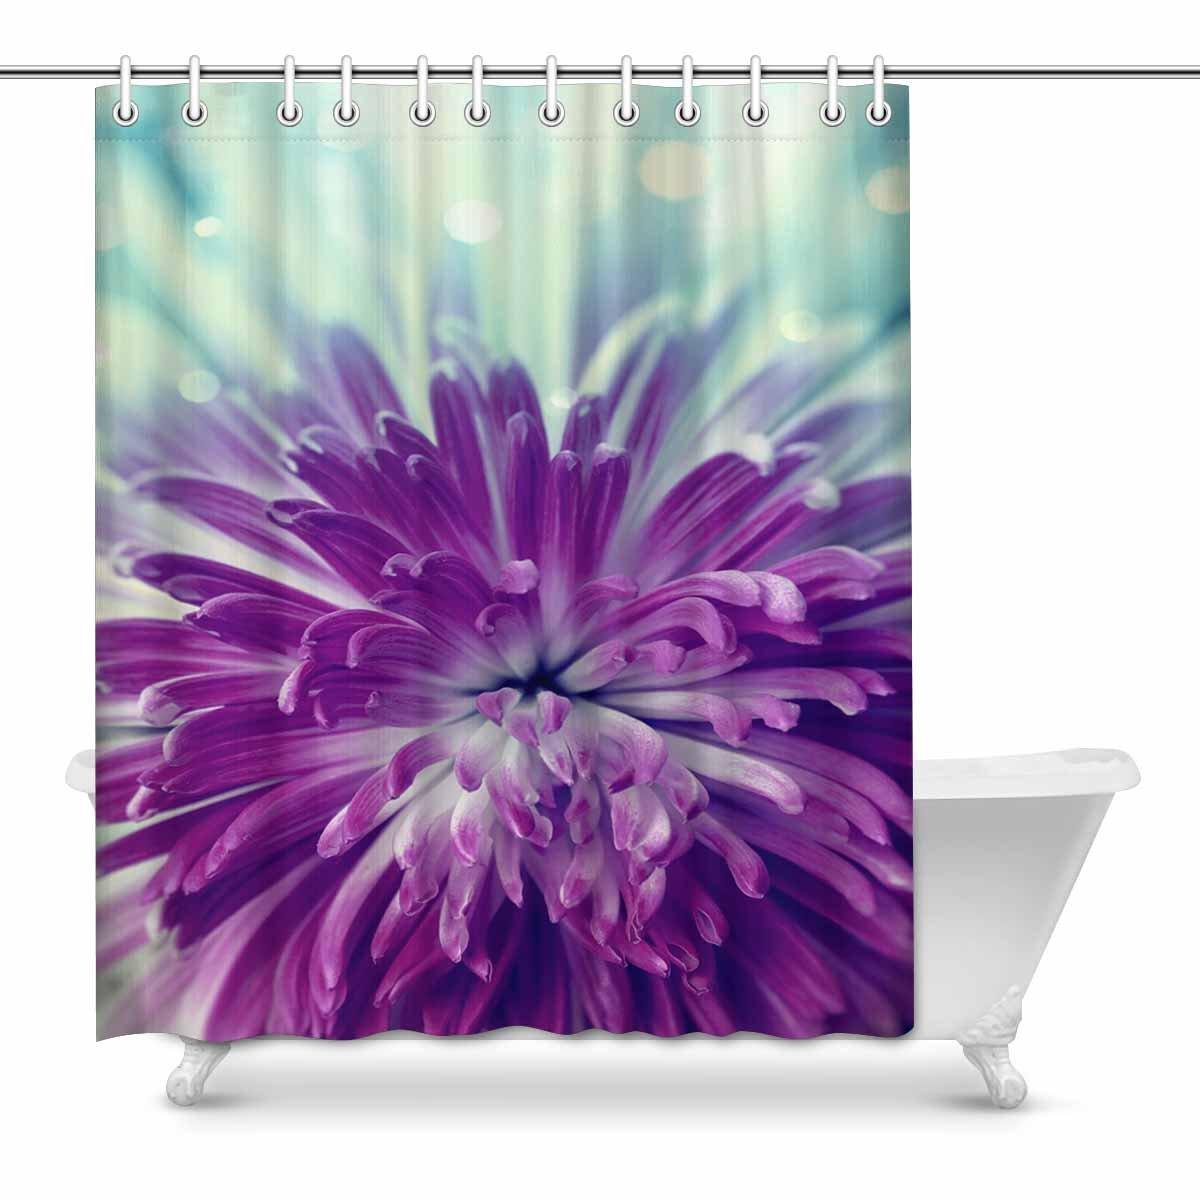 interestprint明るいシームレスなグランジカラフルエスニックBlots 花びら 葉と花ファブリック浴室シャワーカーテンフック付きインテリアセット 60 W x X 即納 inches B07BF8HHK4 マルチ2 72 72l 公式